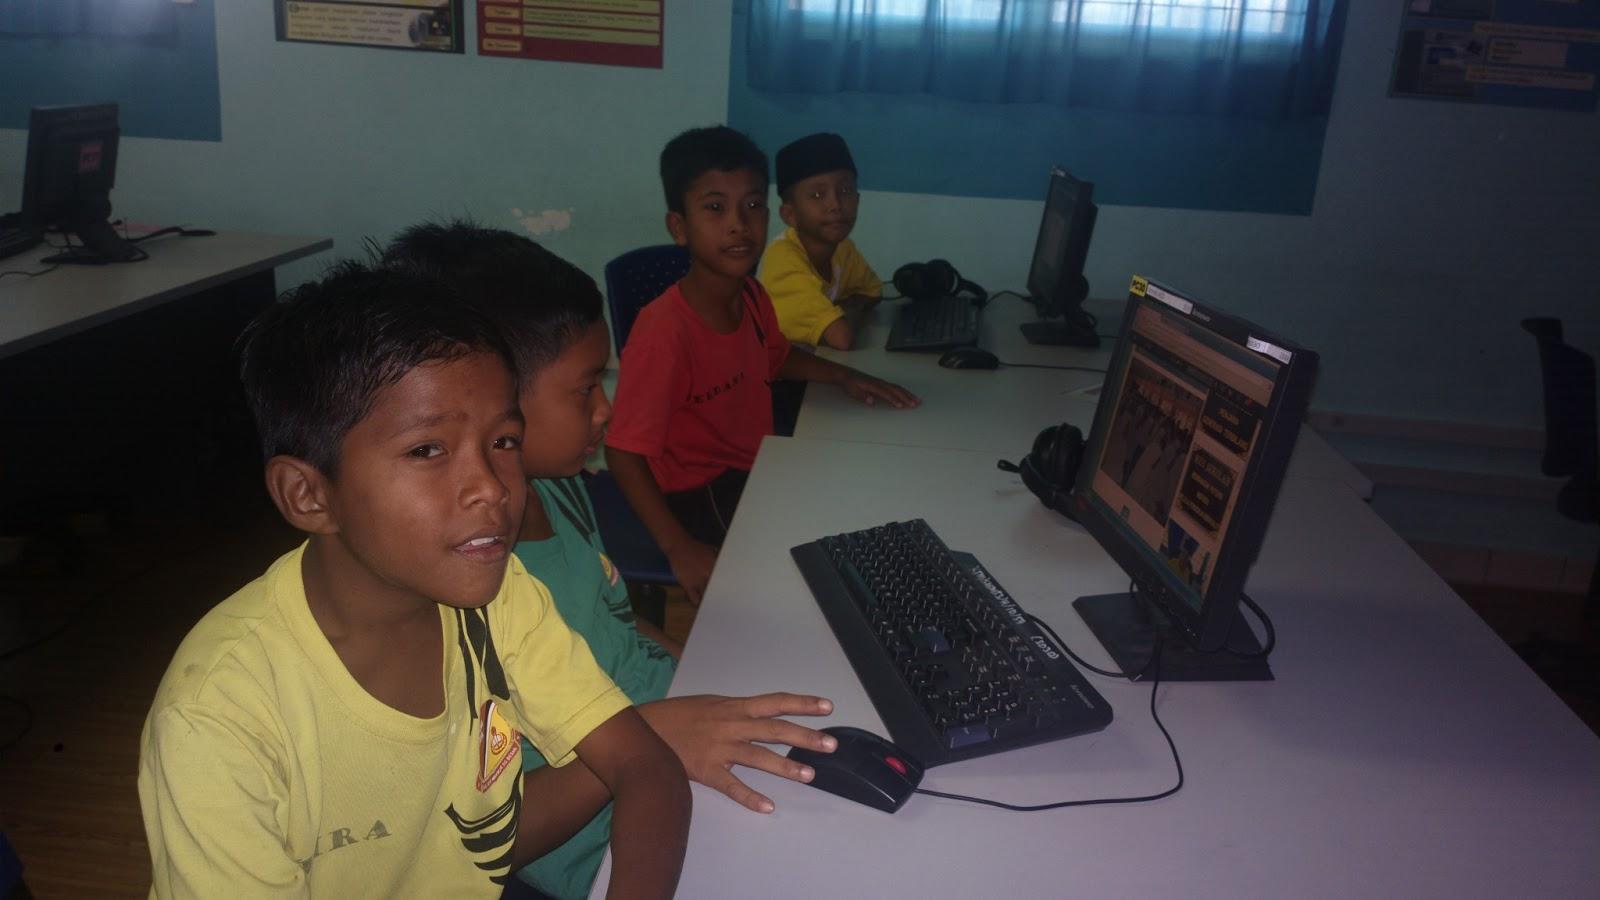 Makmal ICT, SKSM. 19 Jun 2013 - Vle Frog - Hand On 5 Baiduri